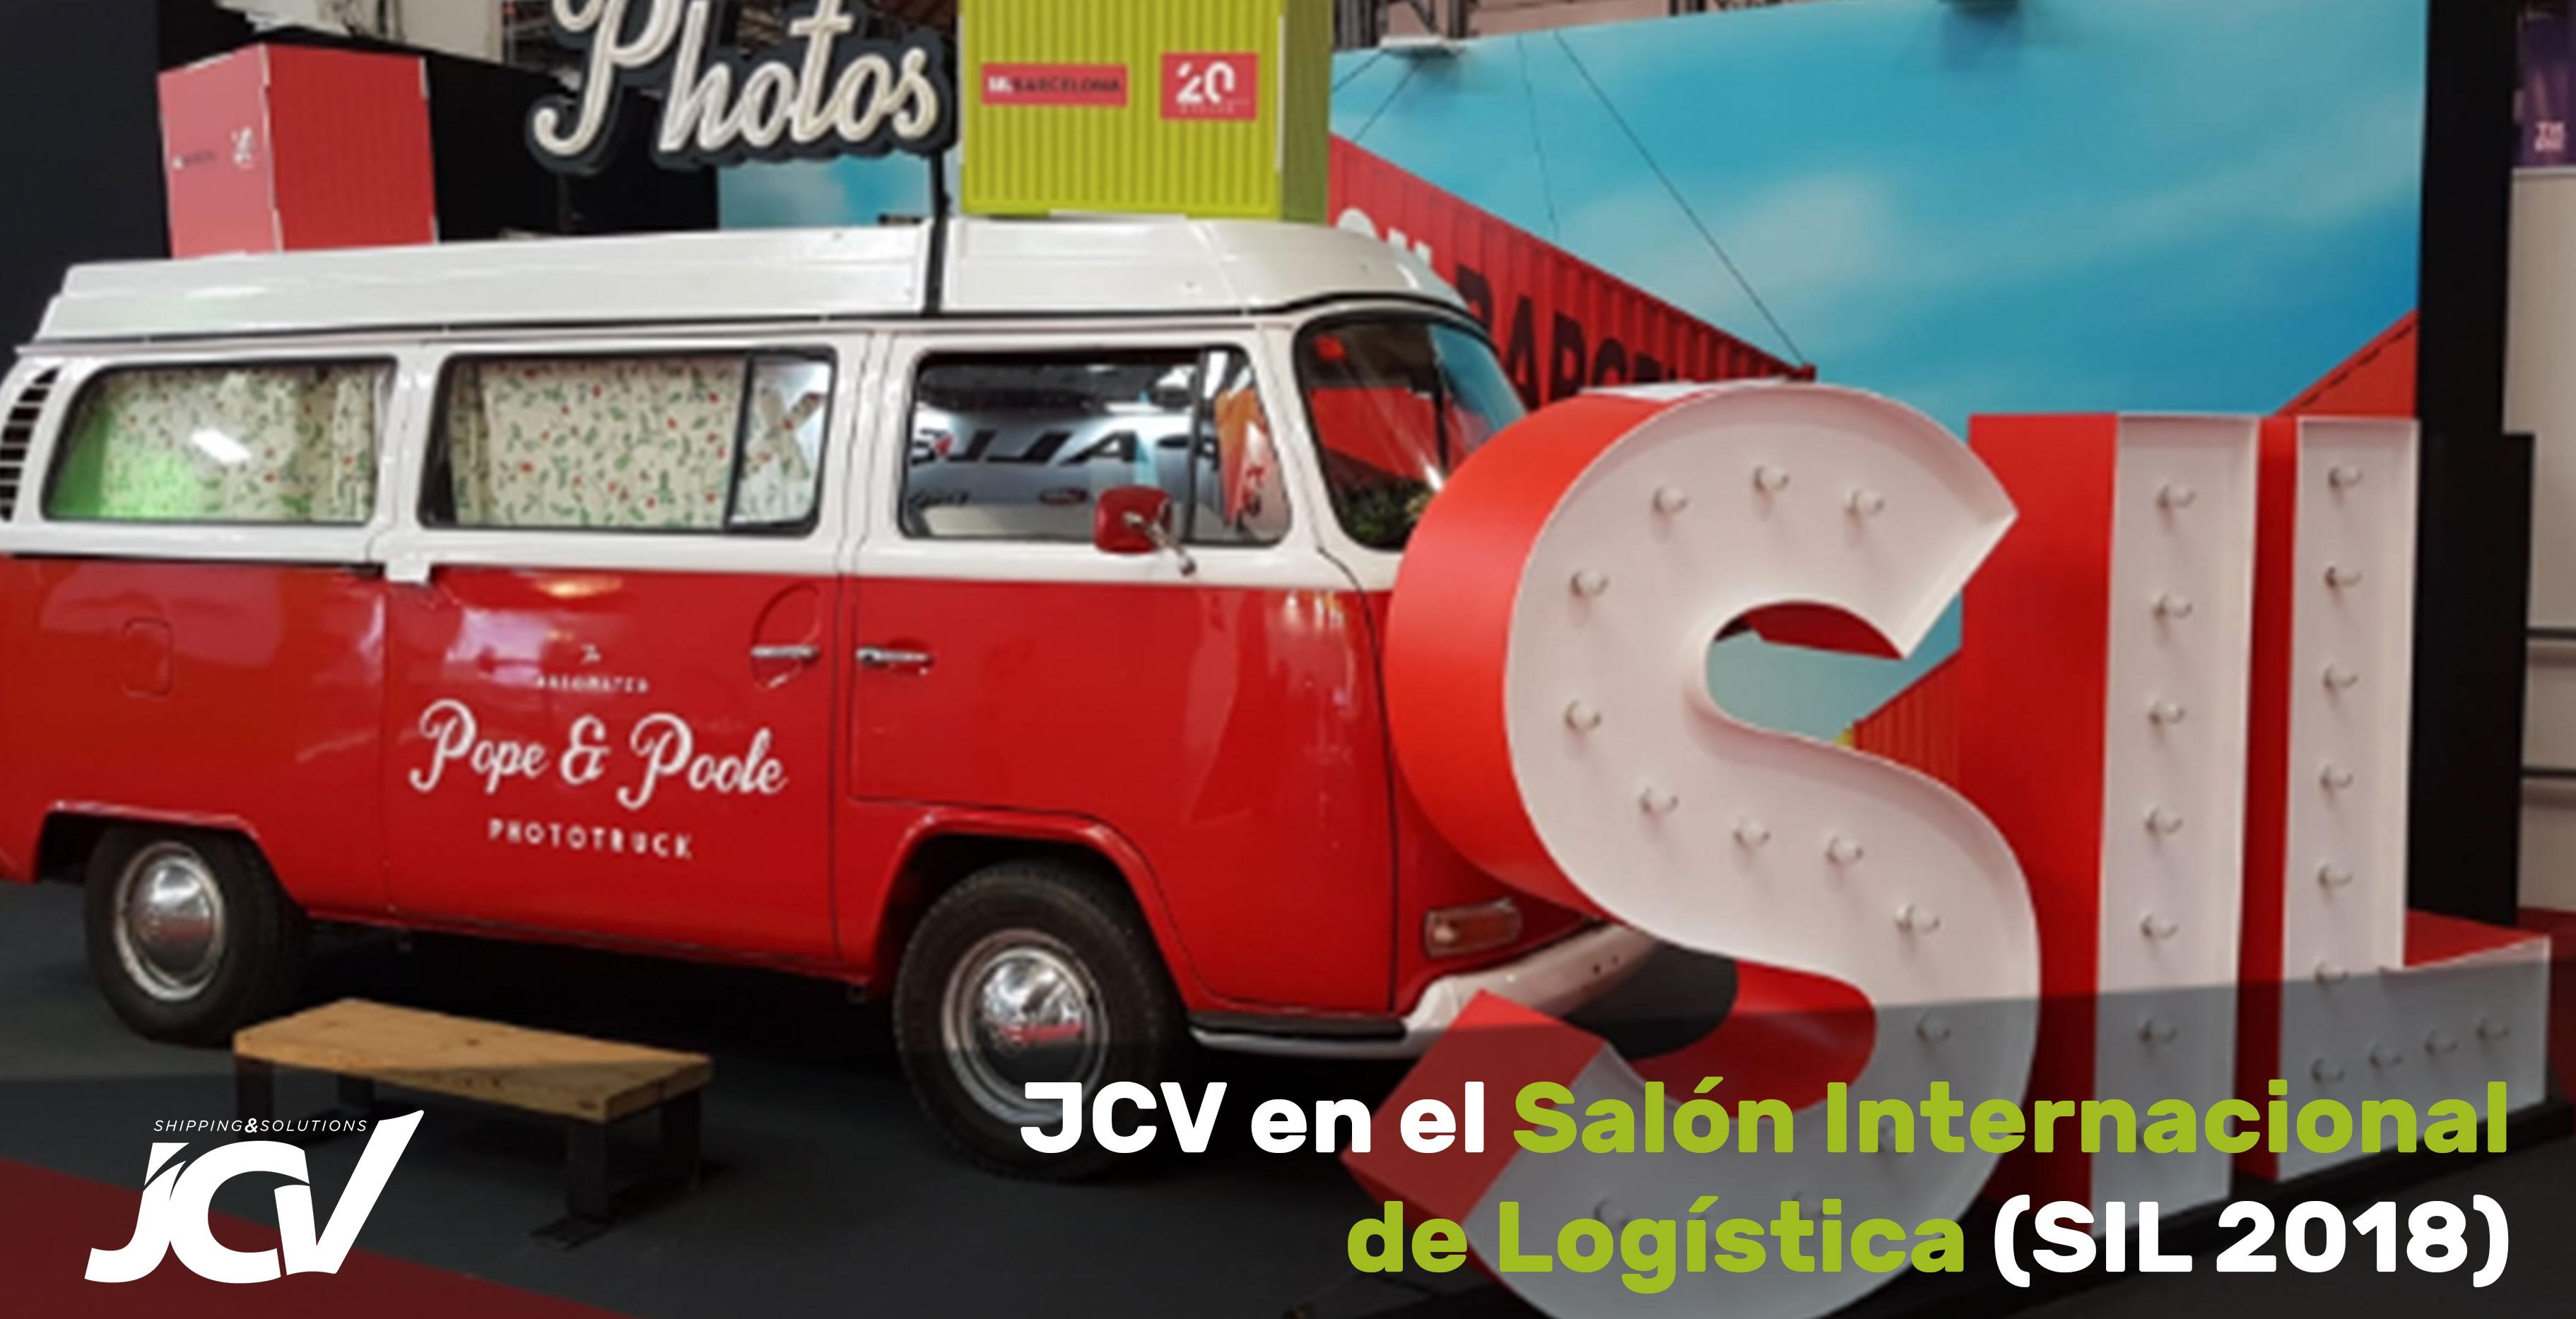 JCV - Expertos en Transporte Marítimo